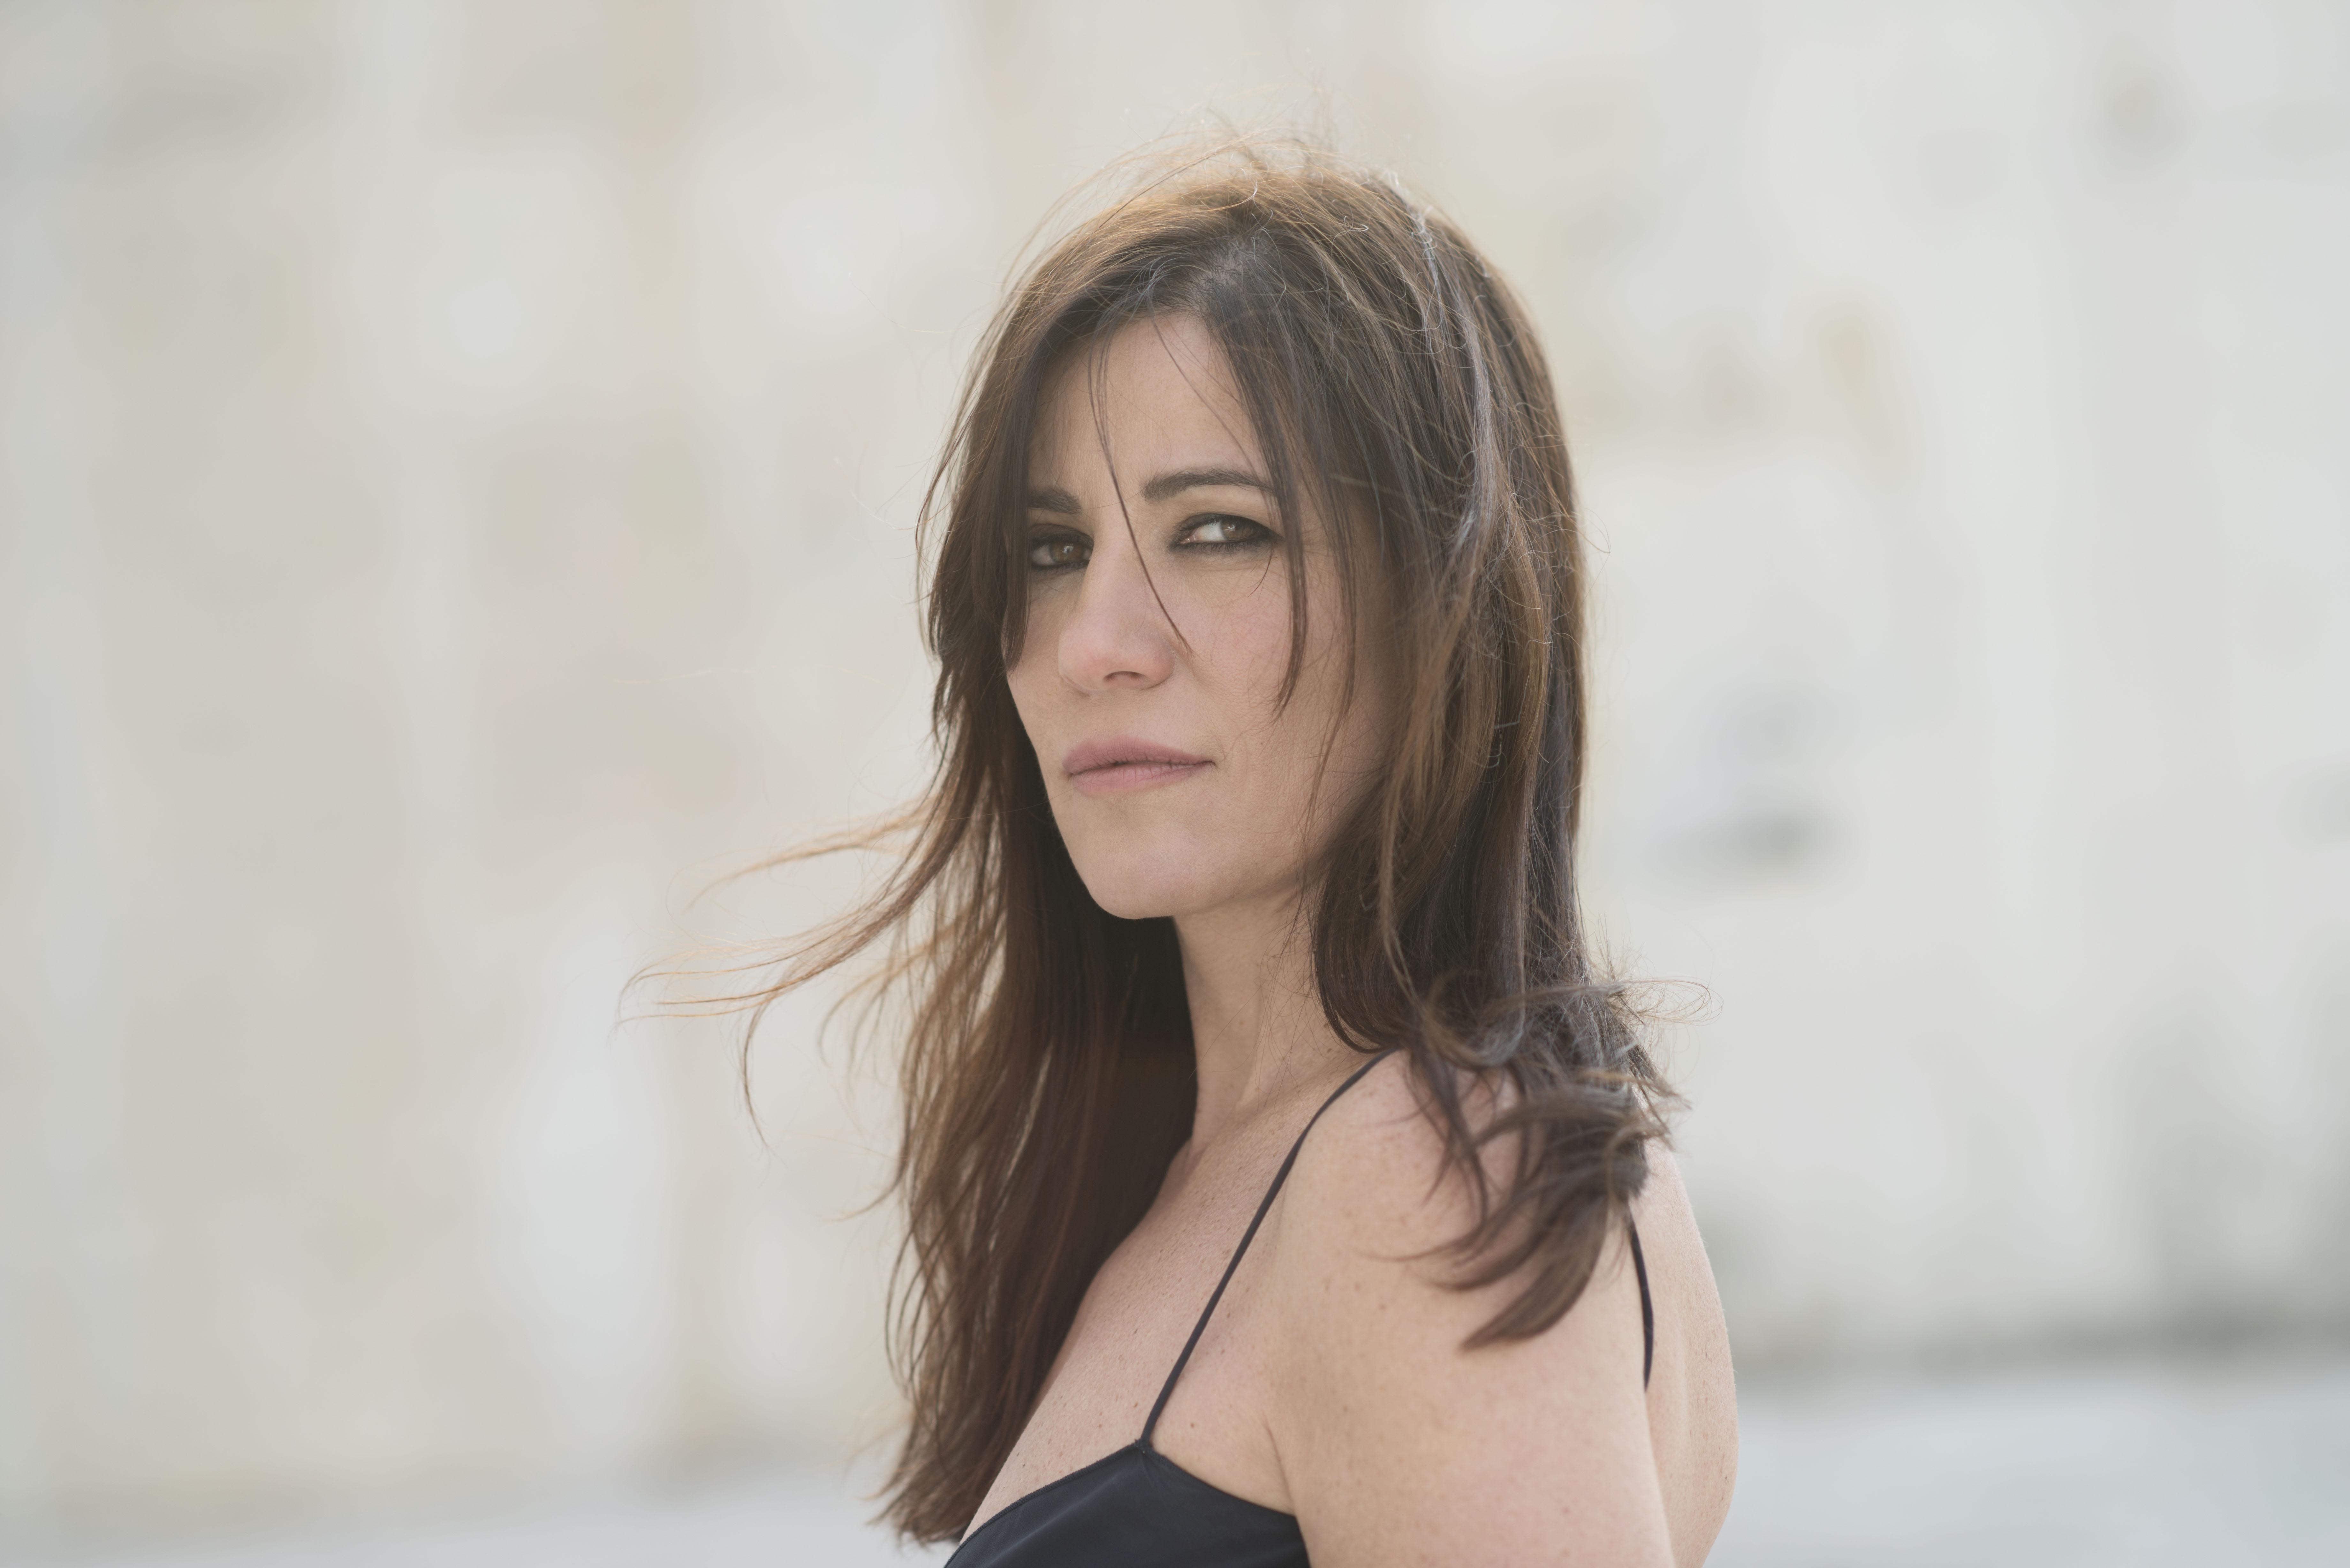 Paola Turci ph Magliocchetti